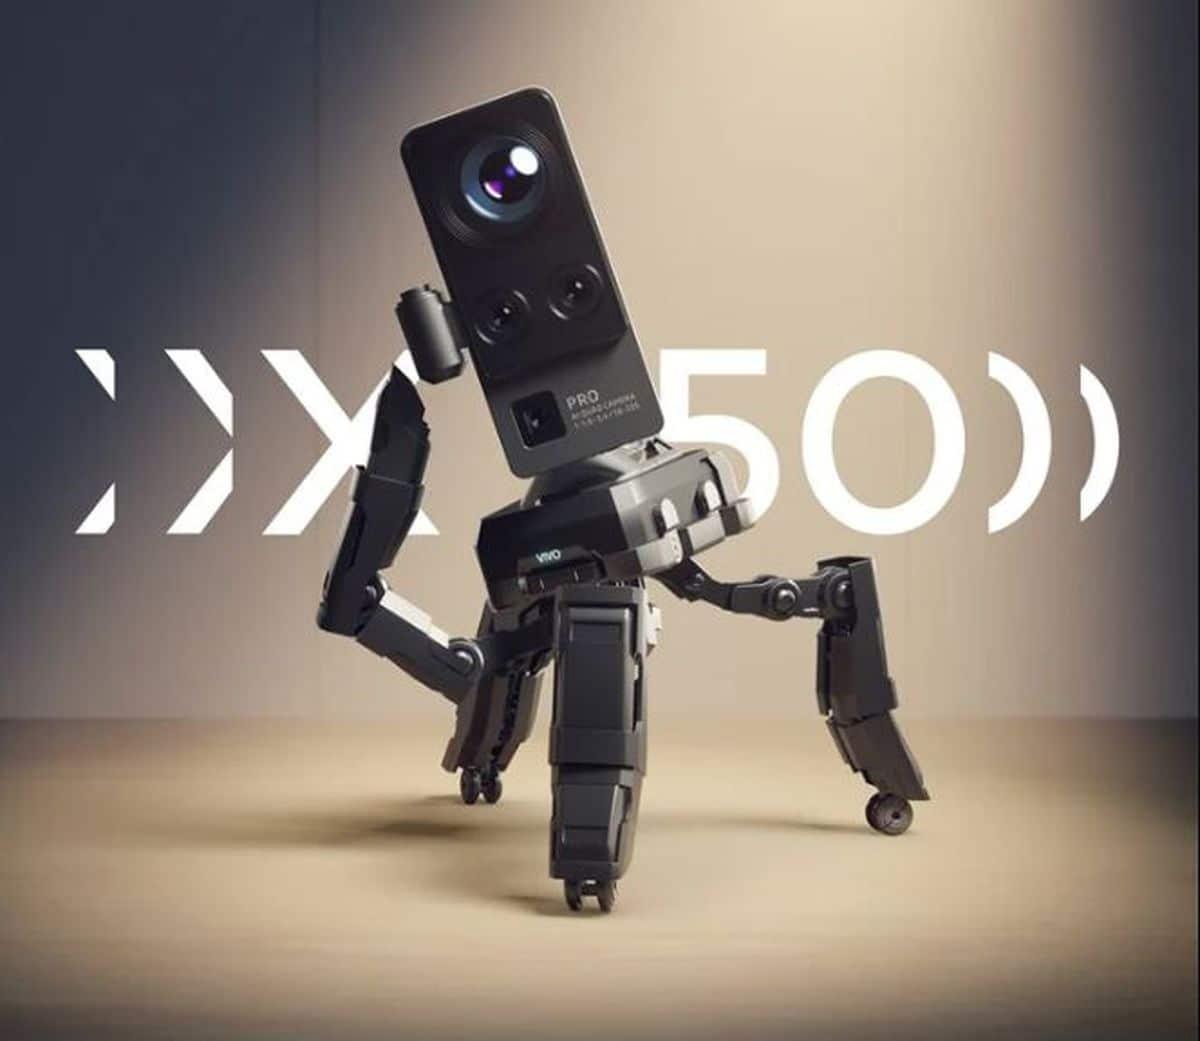 Affiche teaser du Vivo X50